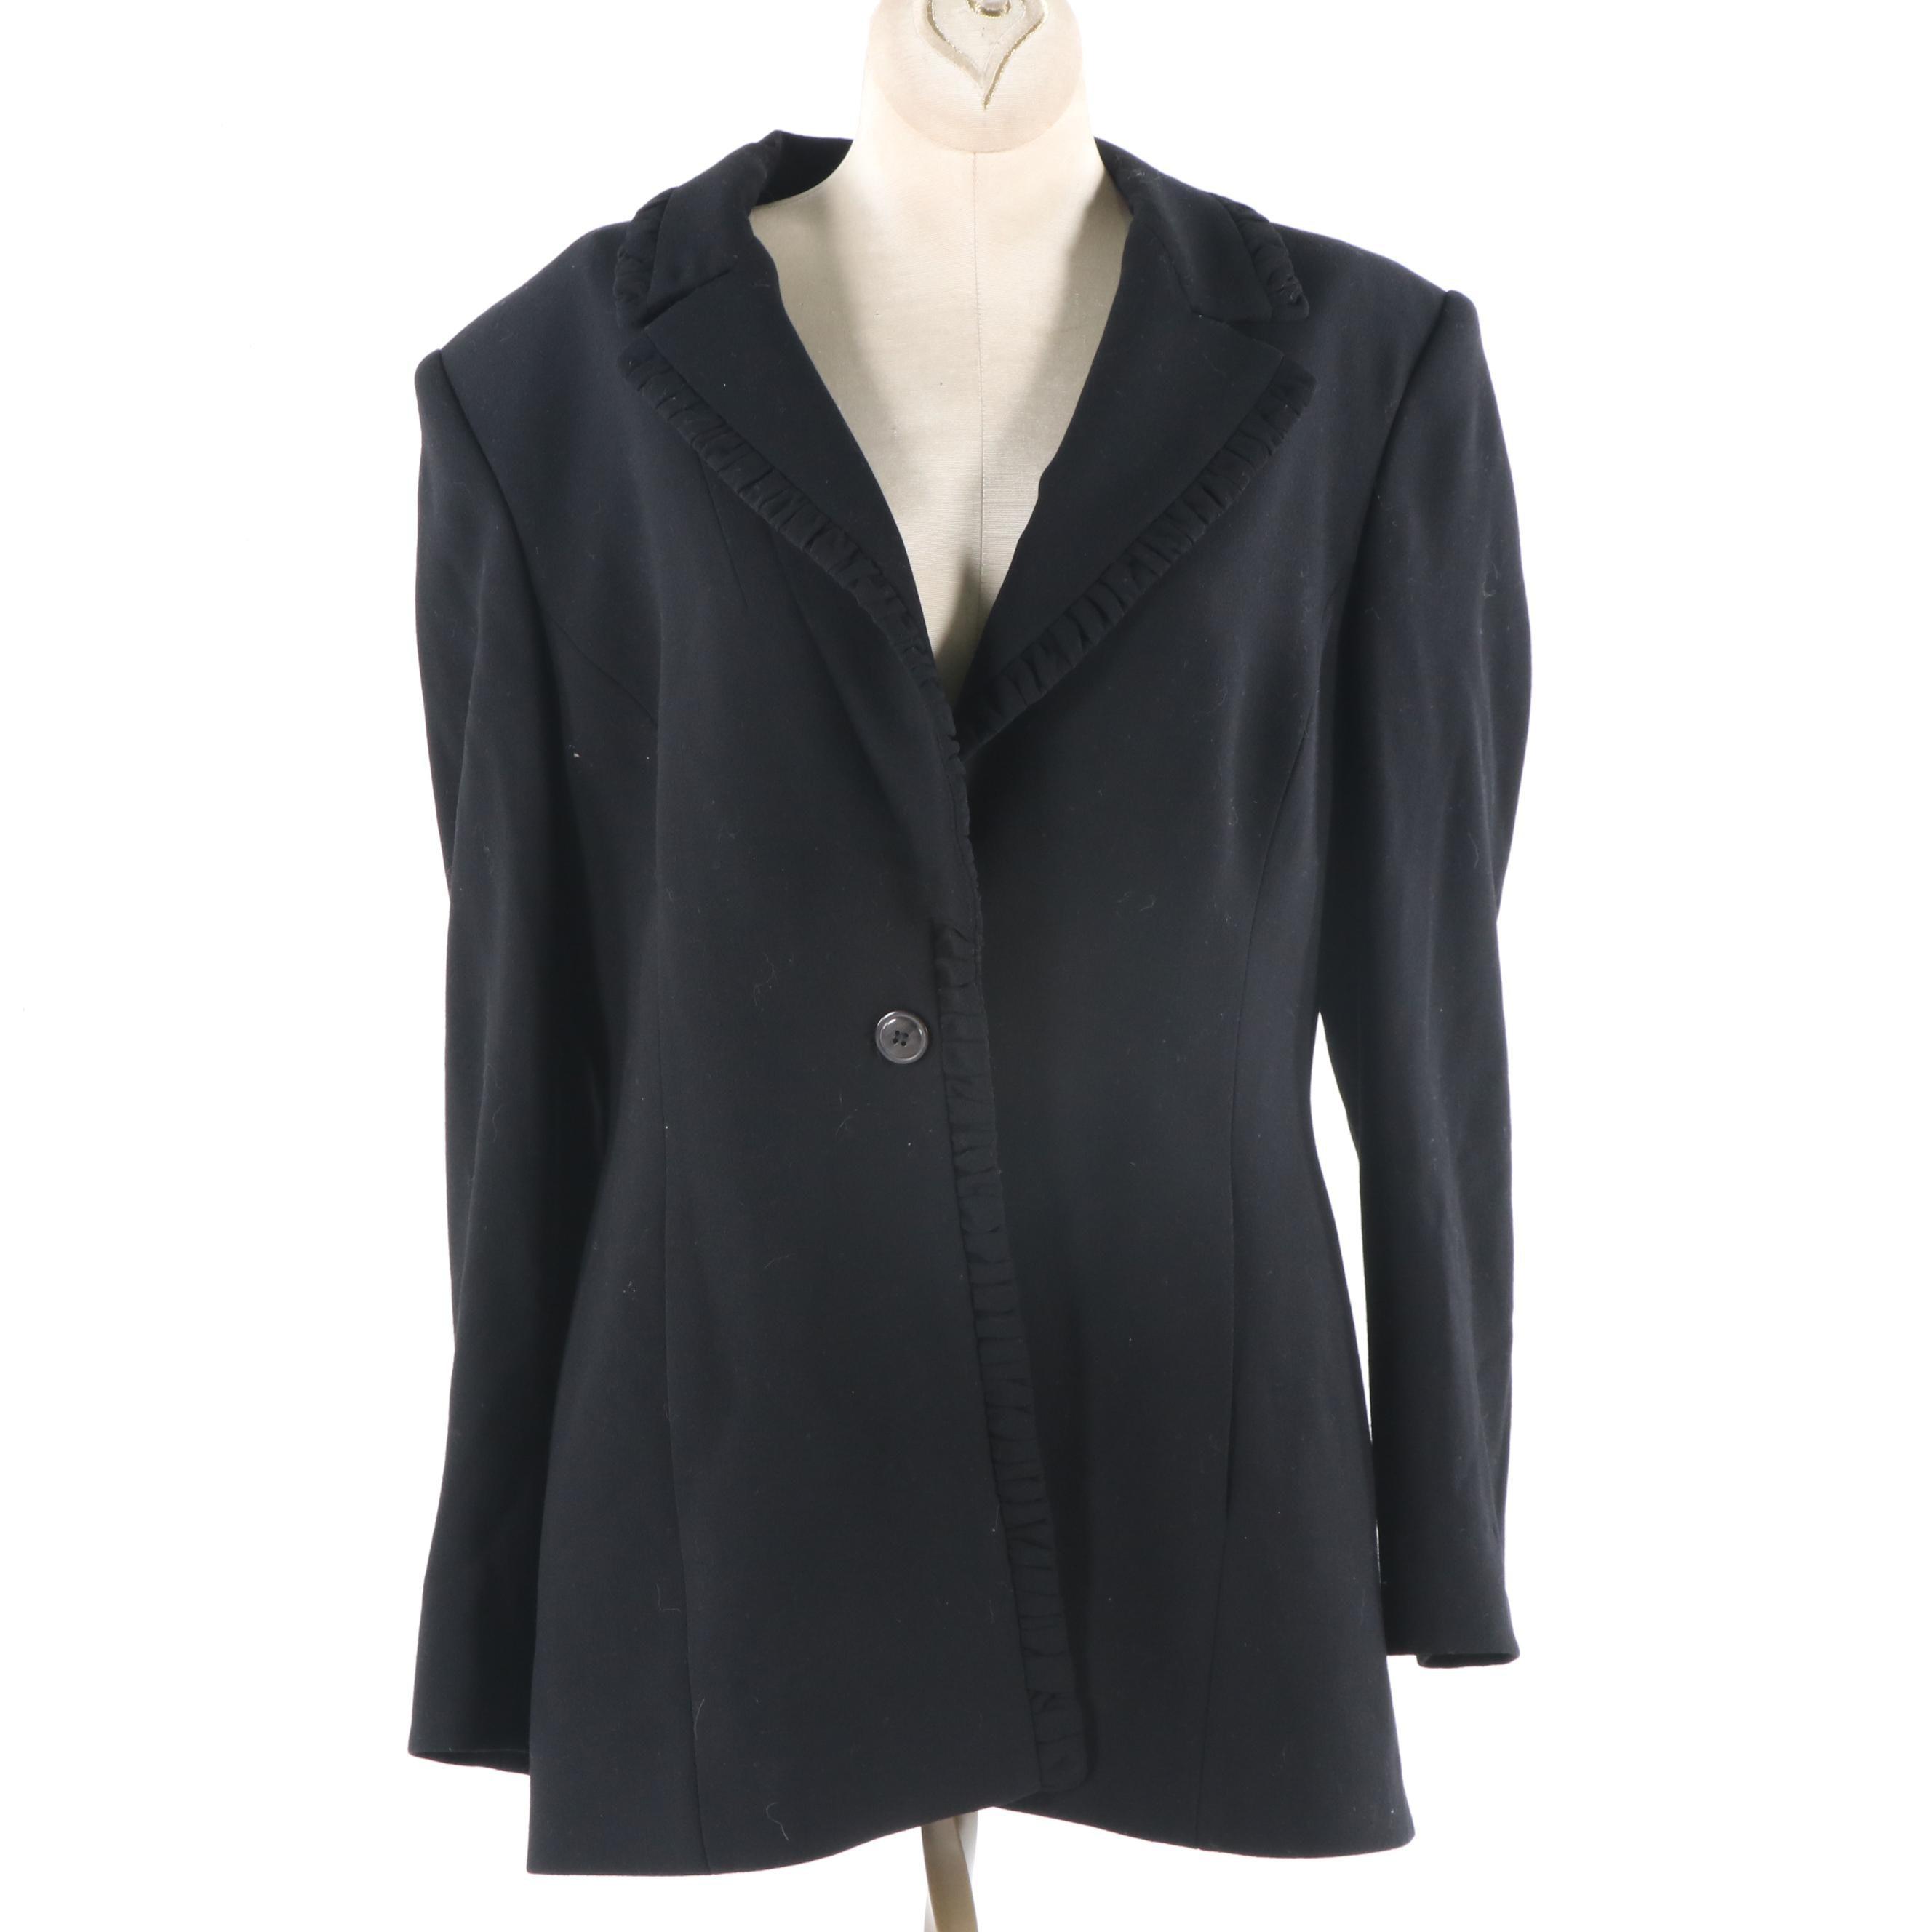 Féraud Black Wool Blazer, Made in Germany